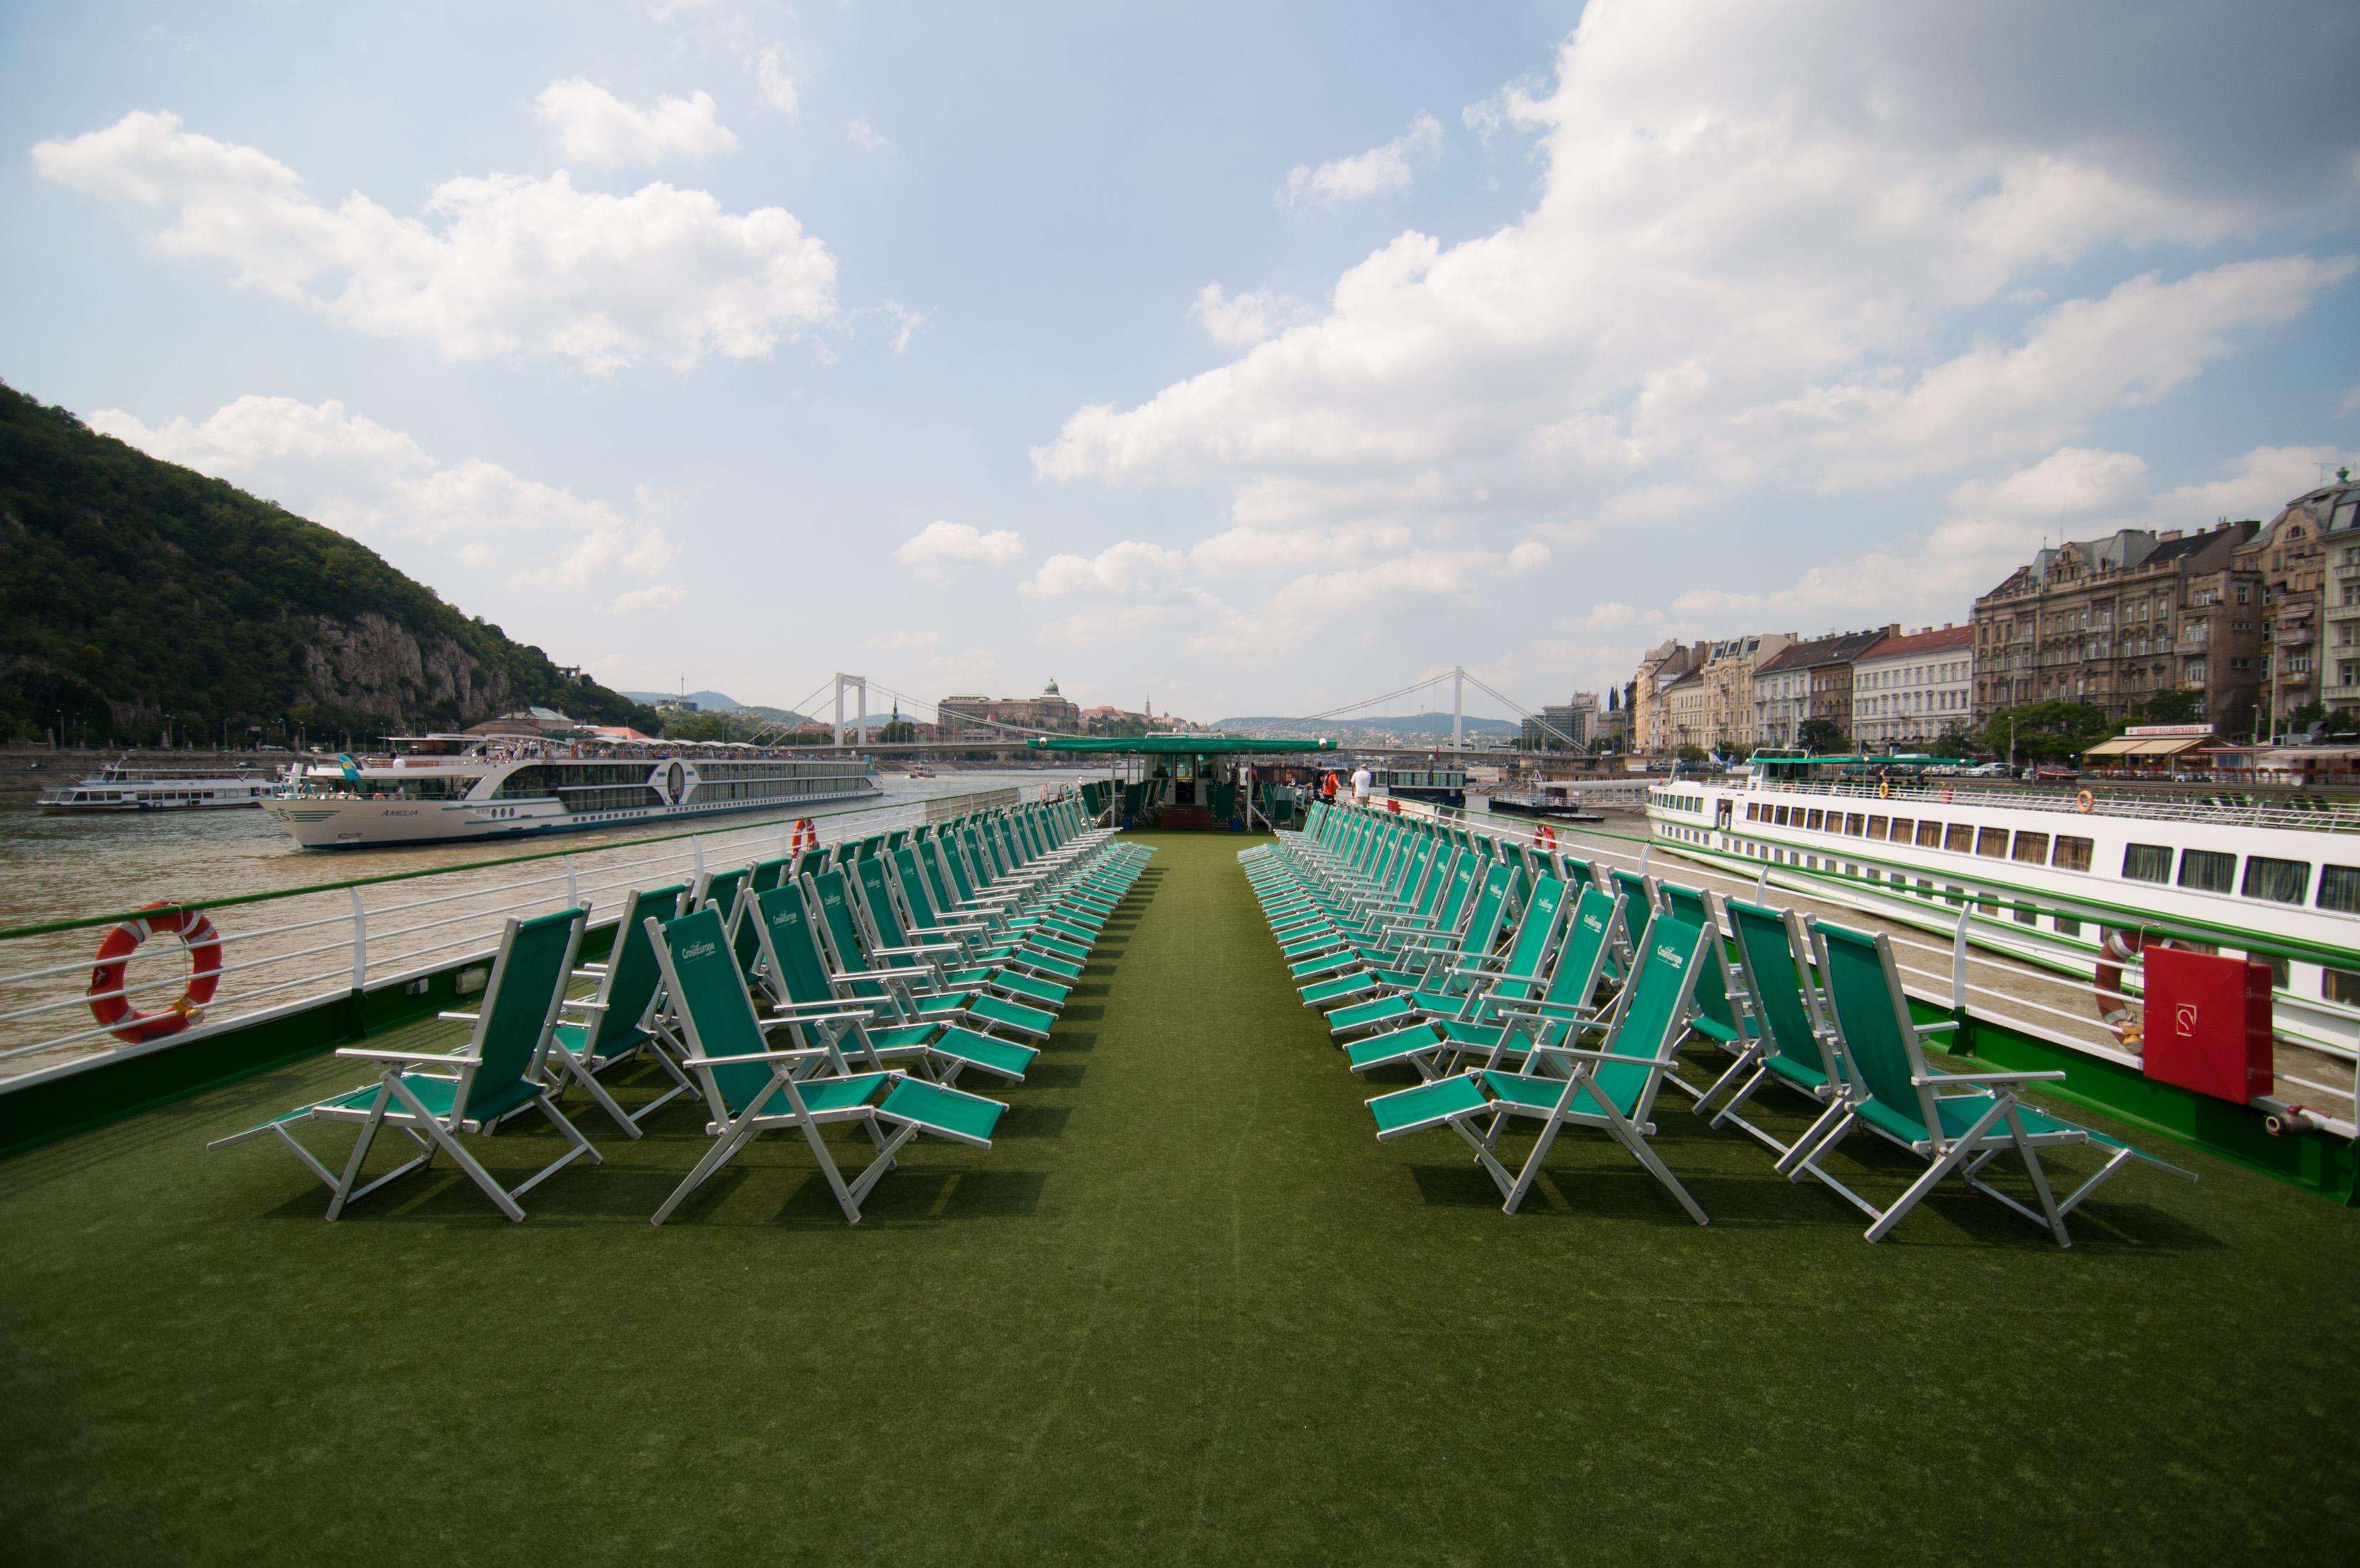 CroisiEurope MS Monet Exterior Sun Deck Lounge Chairs 2.jpg